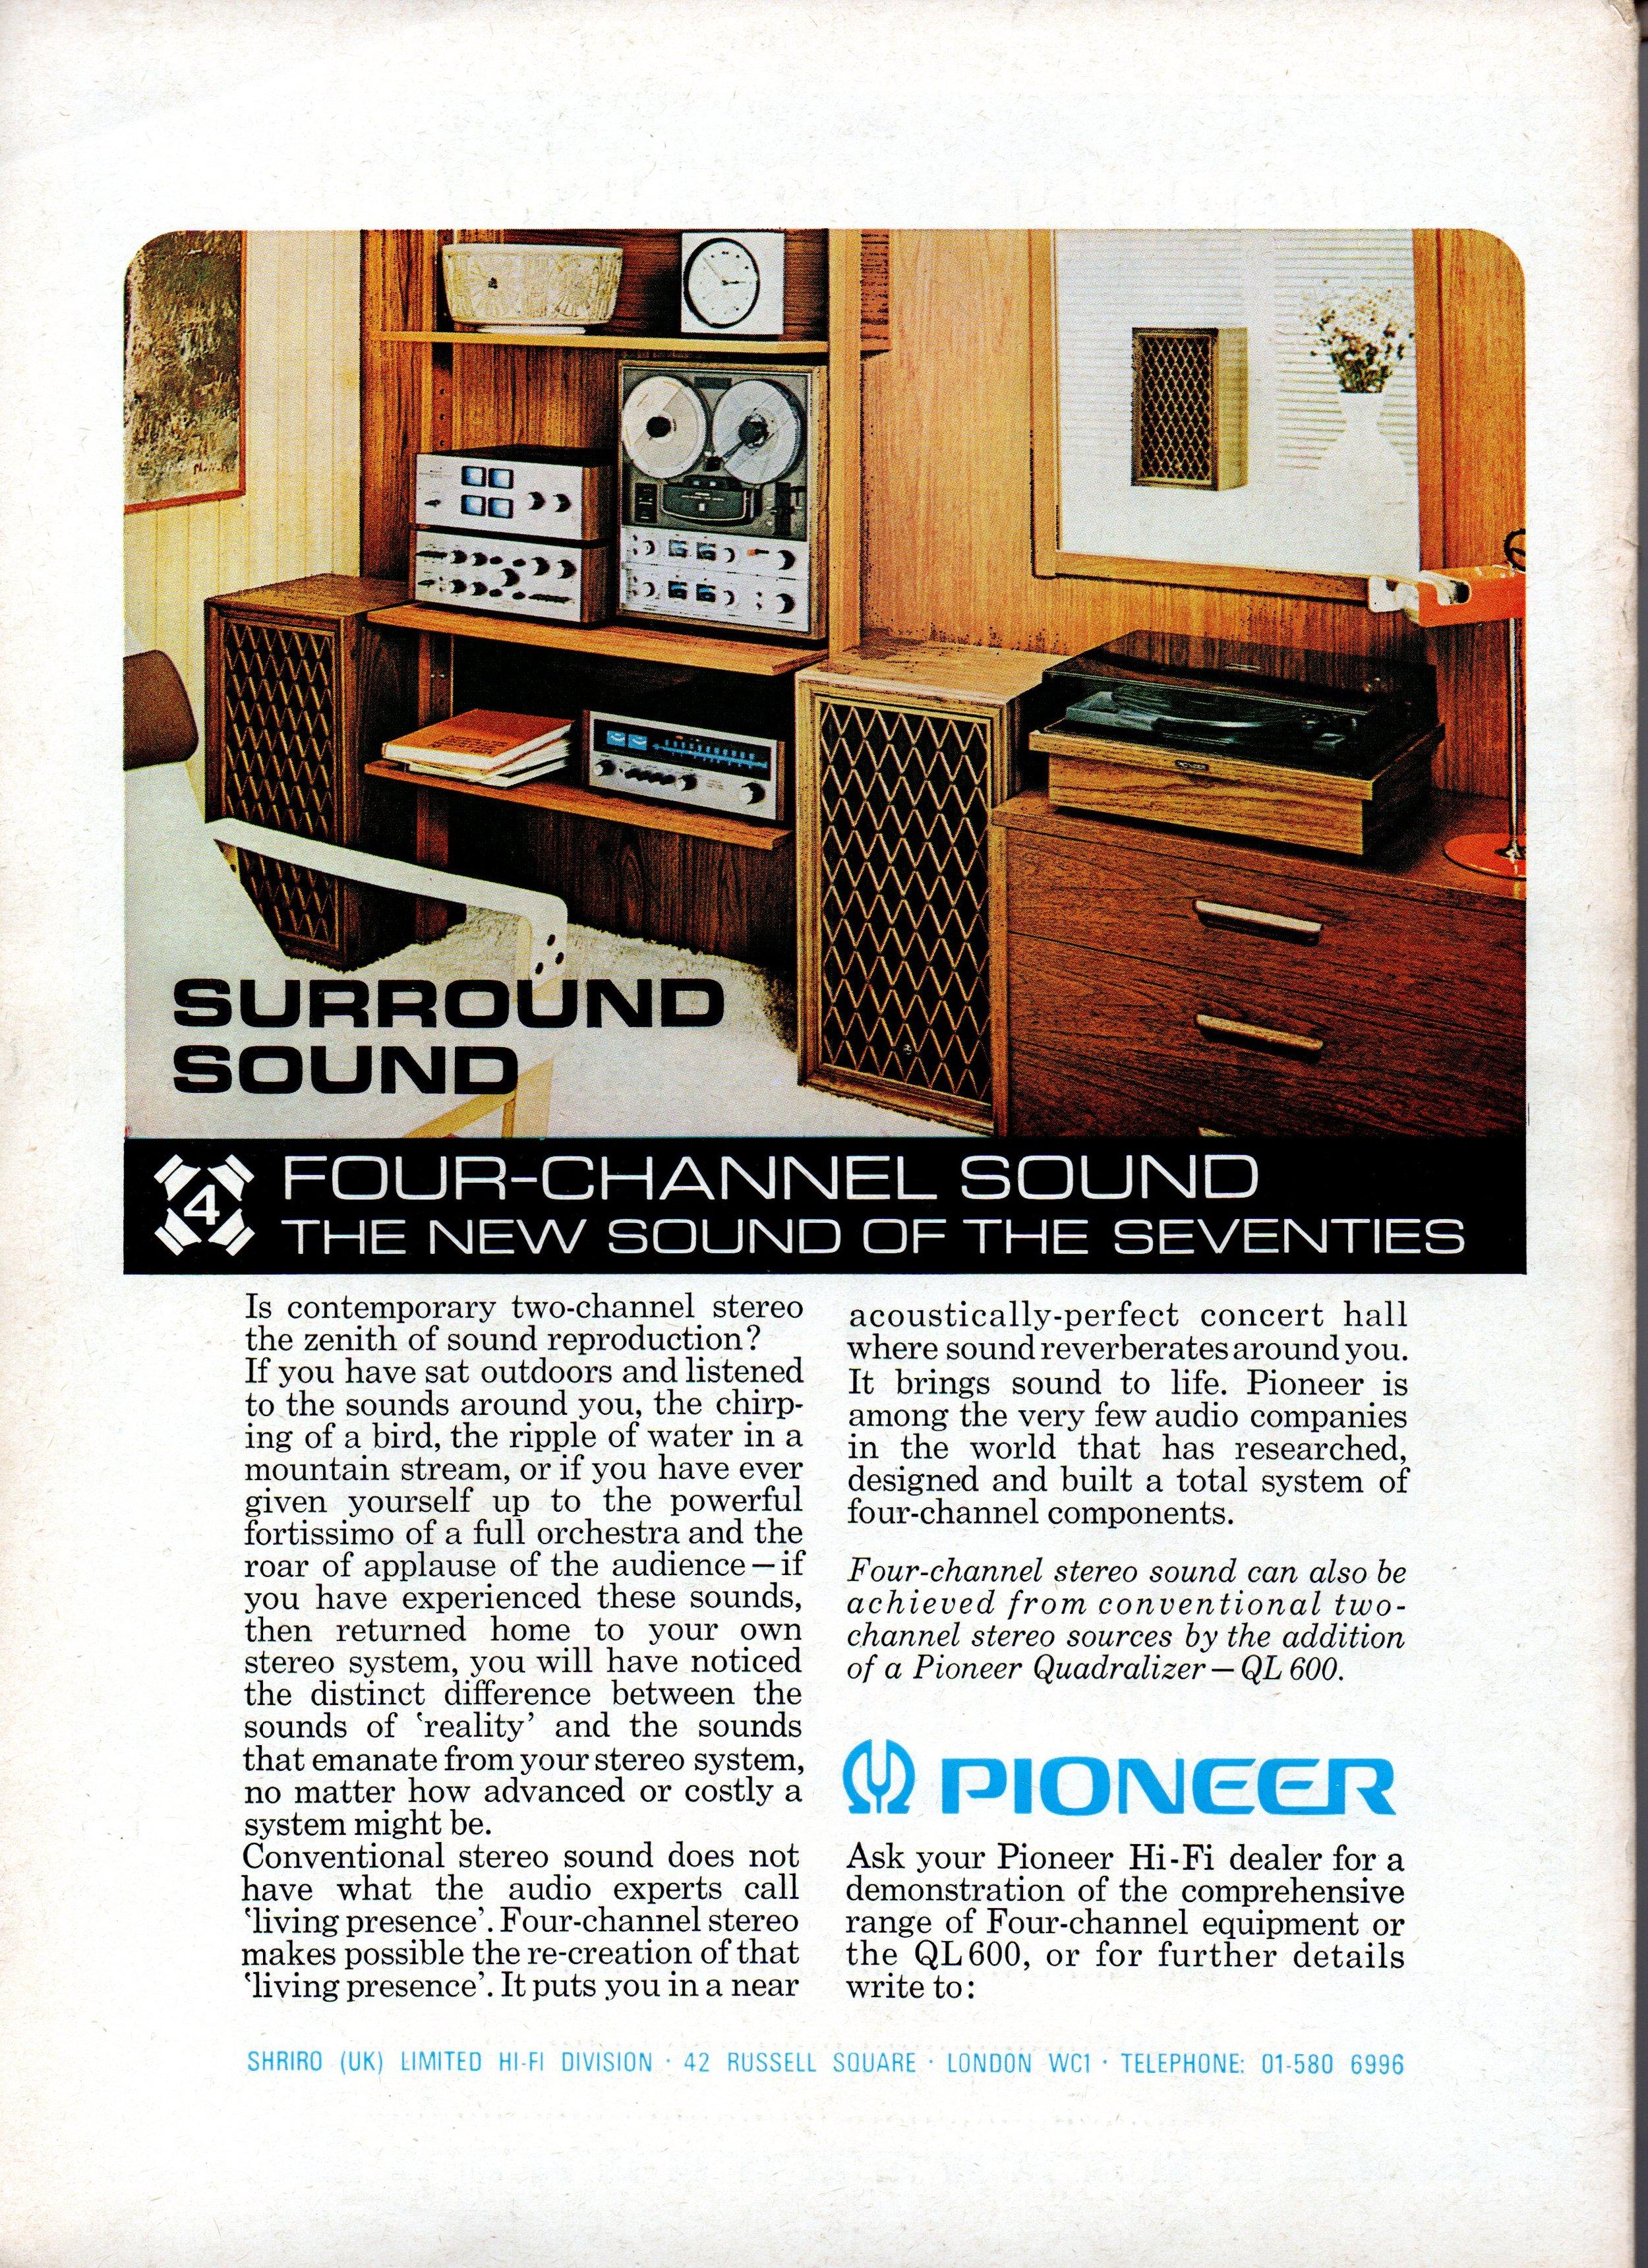 Pioneer 4-Channel Sound Advert 1972.jpg